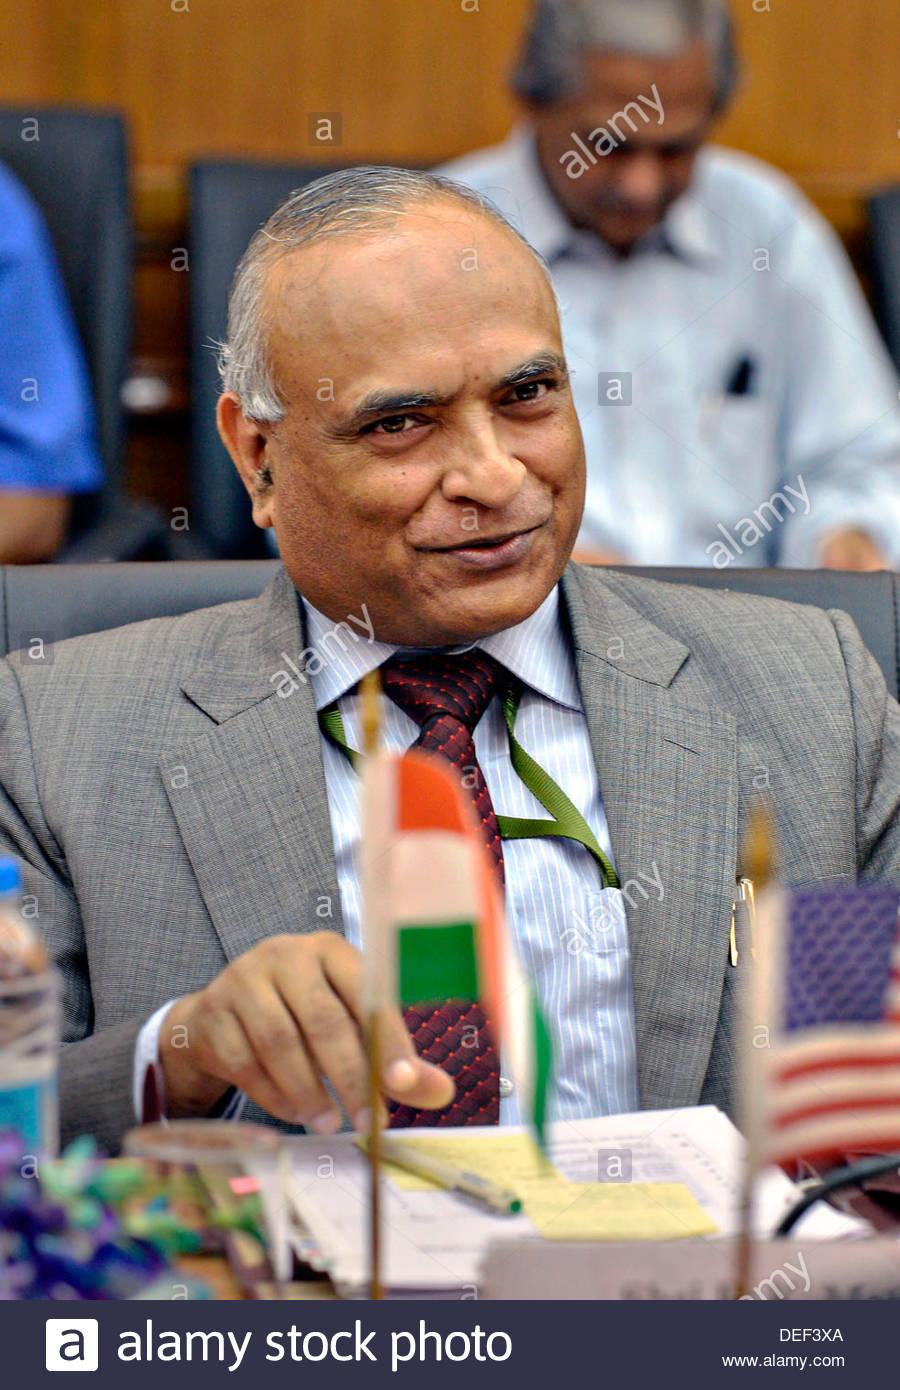 indian-defense-secretary-radha-krishna-mathur-during-a-meeting-with-DEF3XA